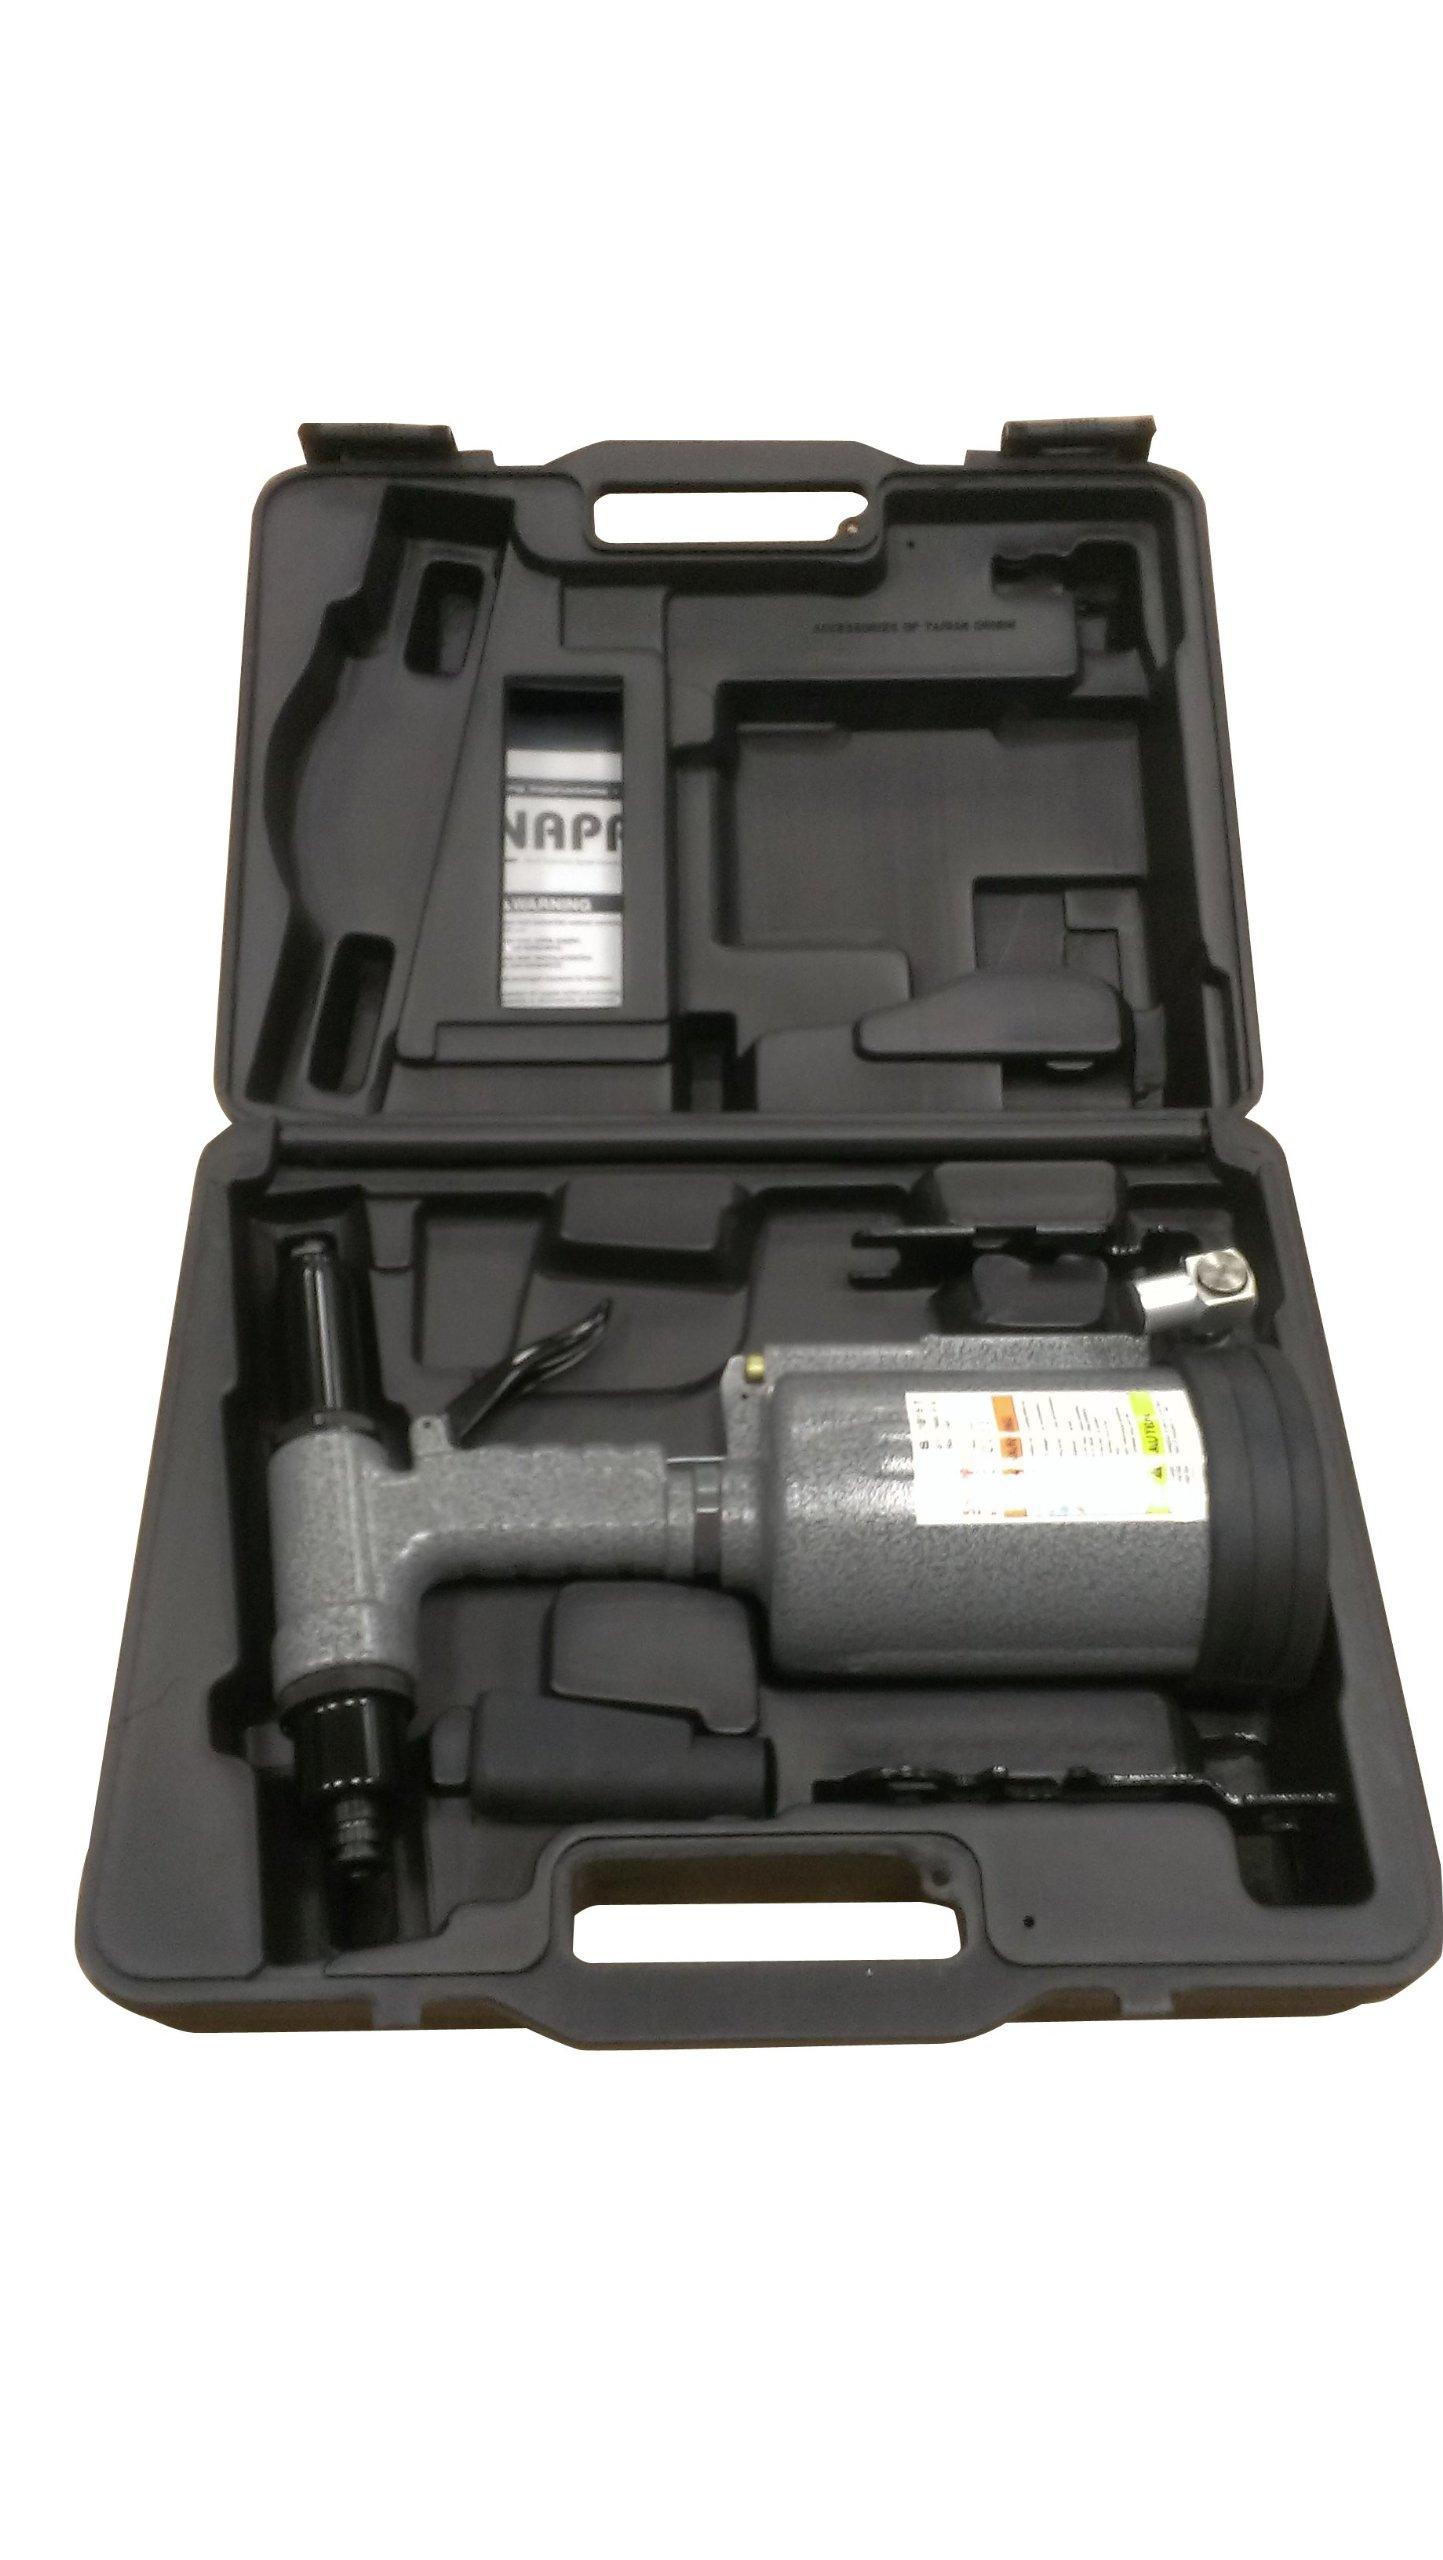 "SX1819T Sunex 3/16"" & ¼"" Heavy Duty Rivet Gun, 3960 lbF, 90PSI by Sunex Tools (Image #3)"